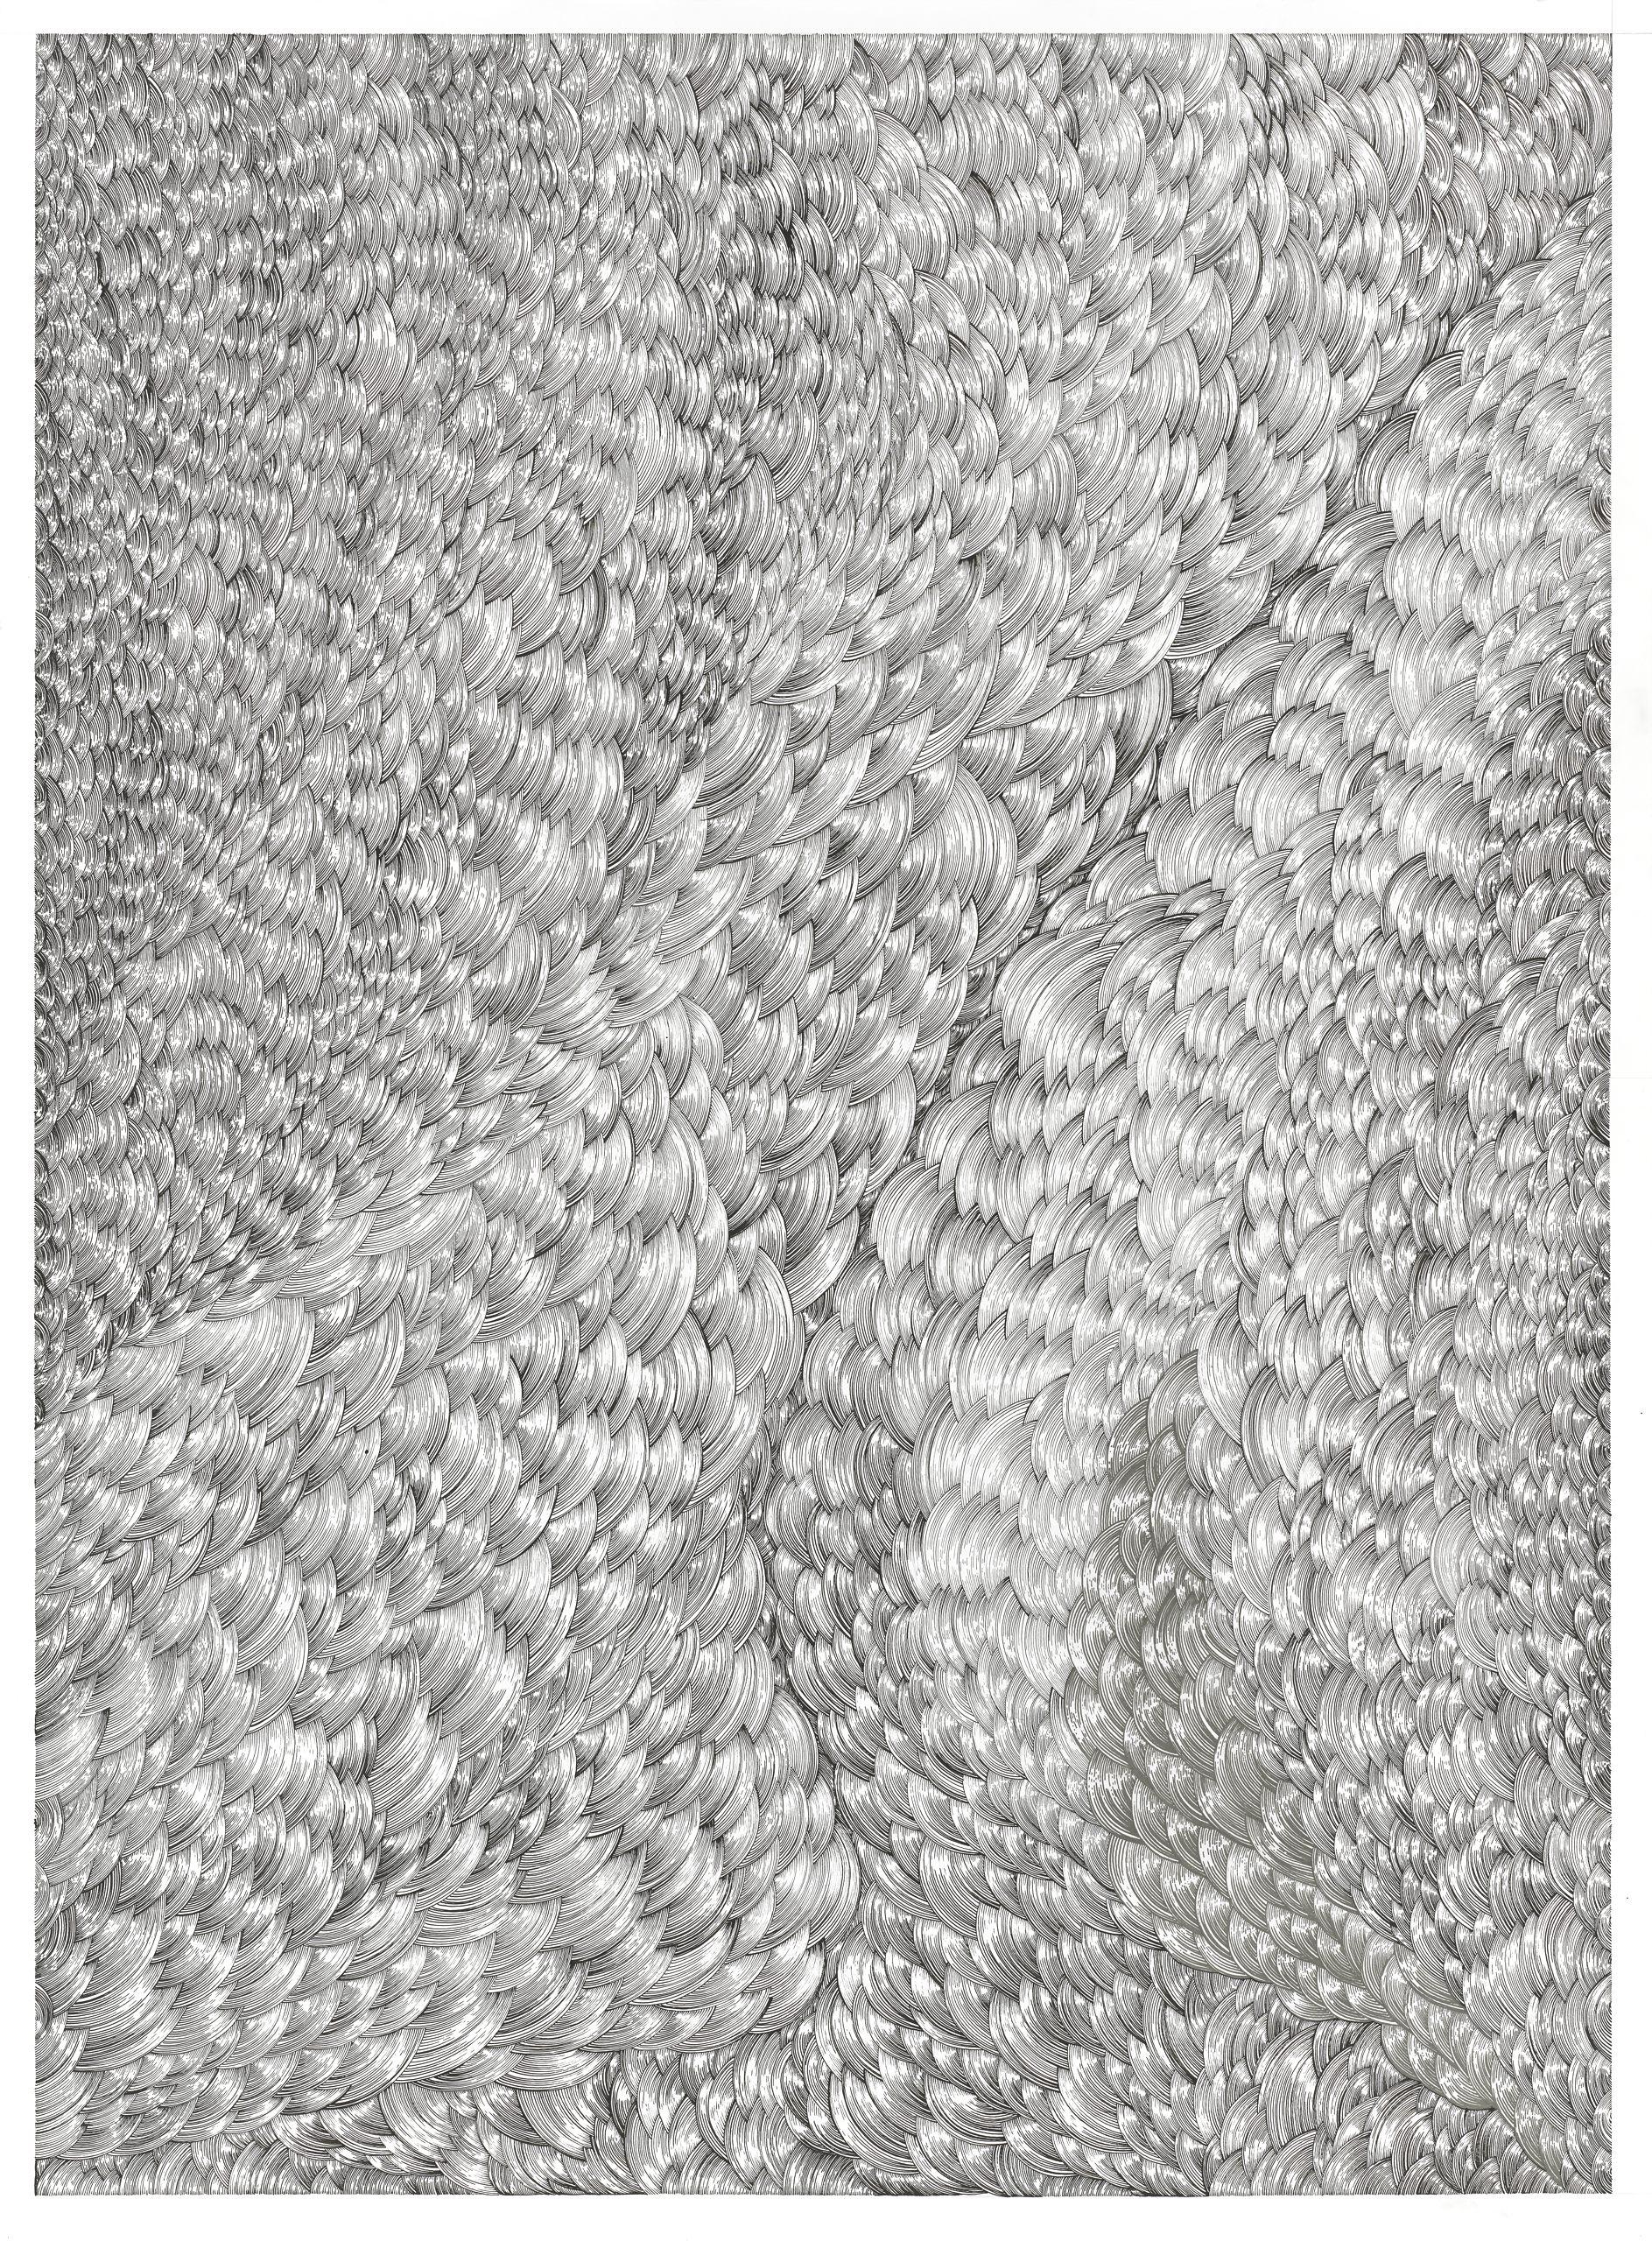 BK P158 | diptychon part B | untitled | acrylic on paper | 200x170cm_2014 | collection kunstwerk alison u. peter w. klein